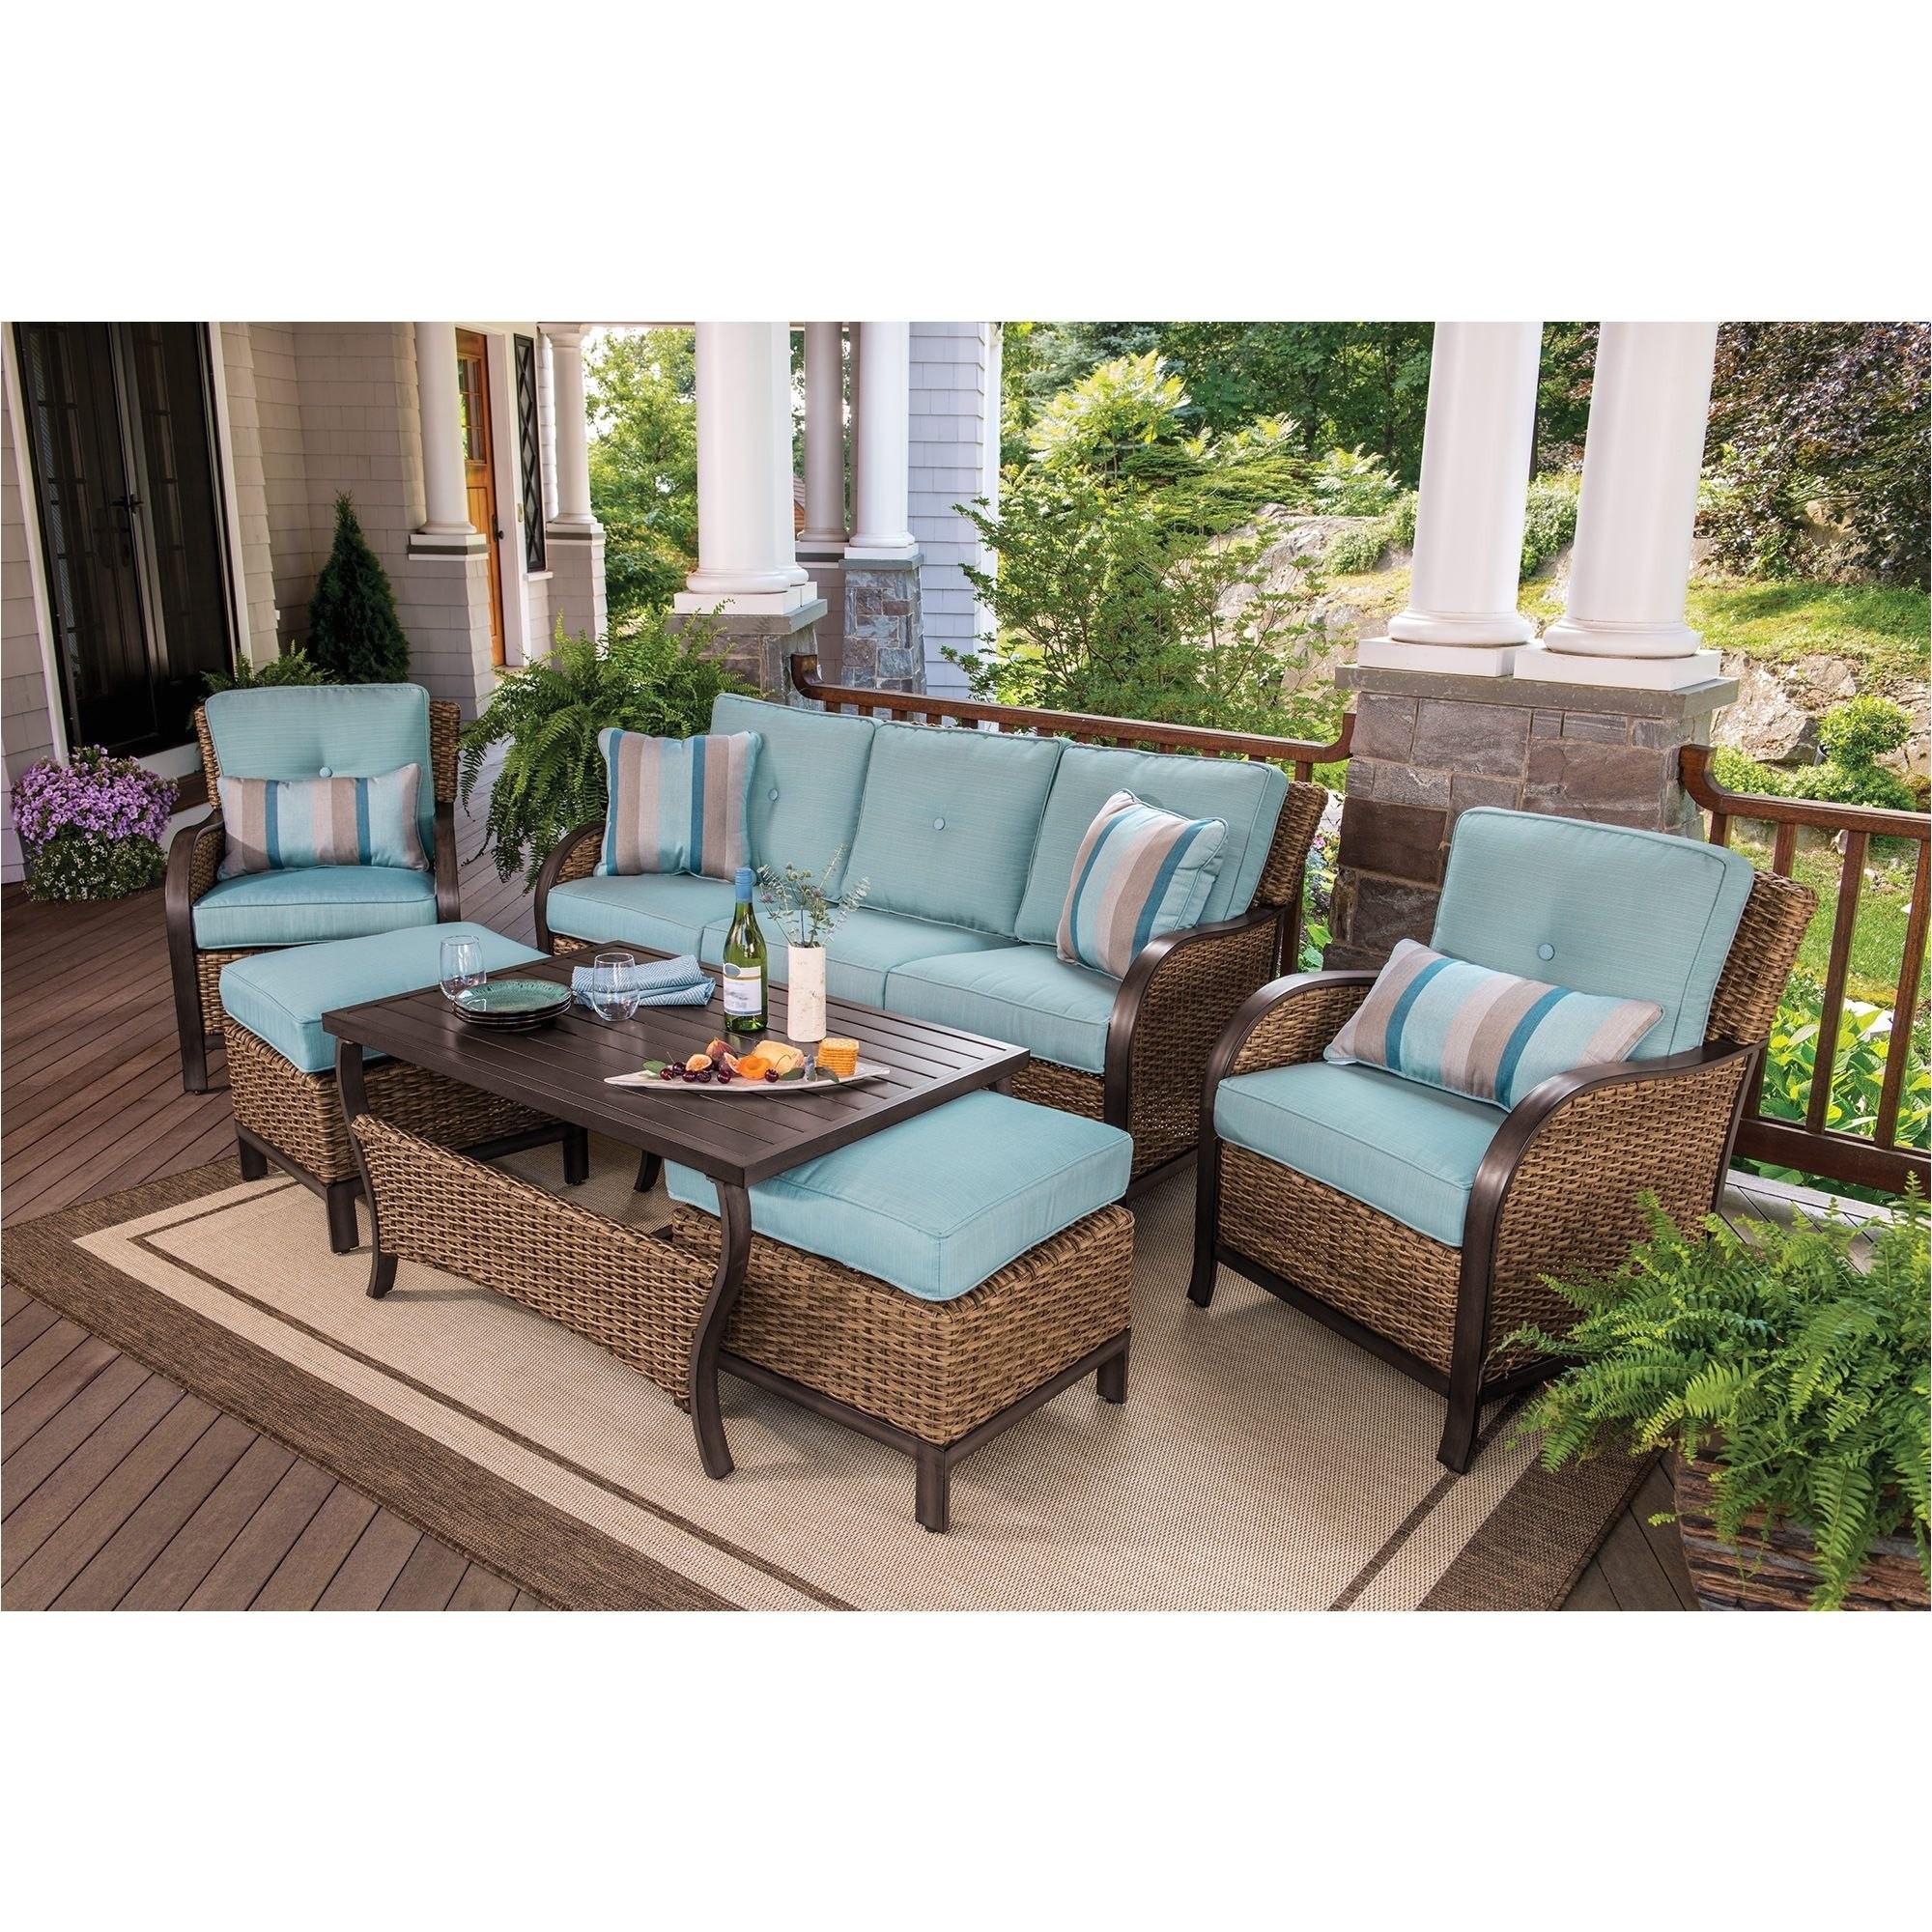 Bjs sofa Set Garden Patio Sets Elegant Bjs Outdoor Patio Furniture Patio Decor